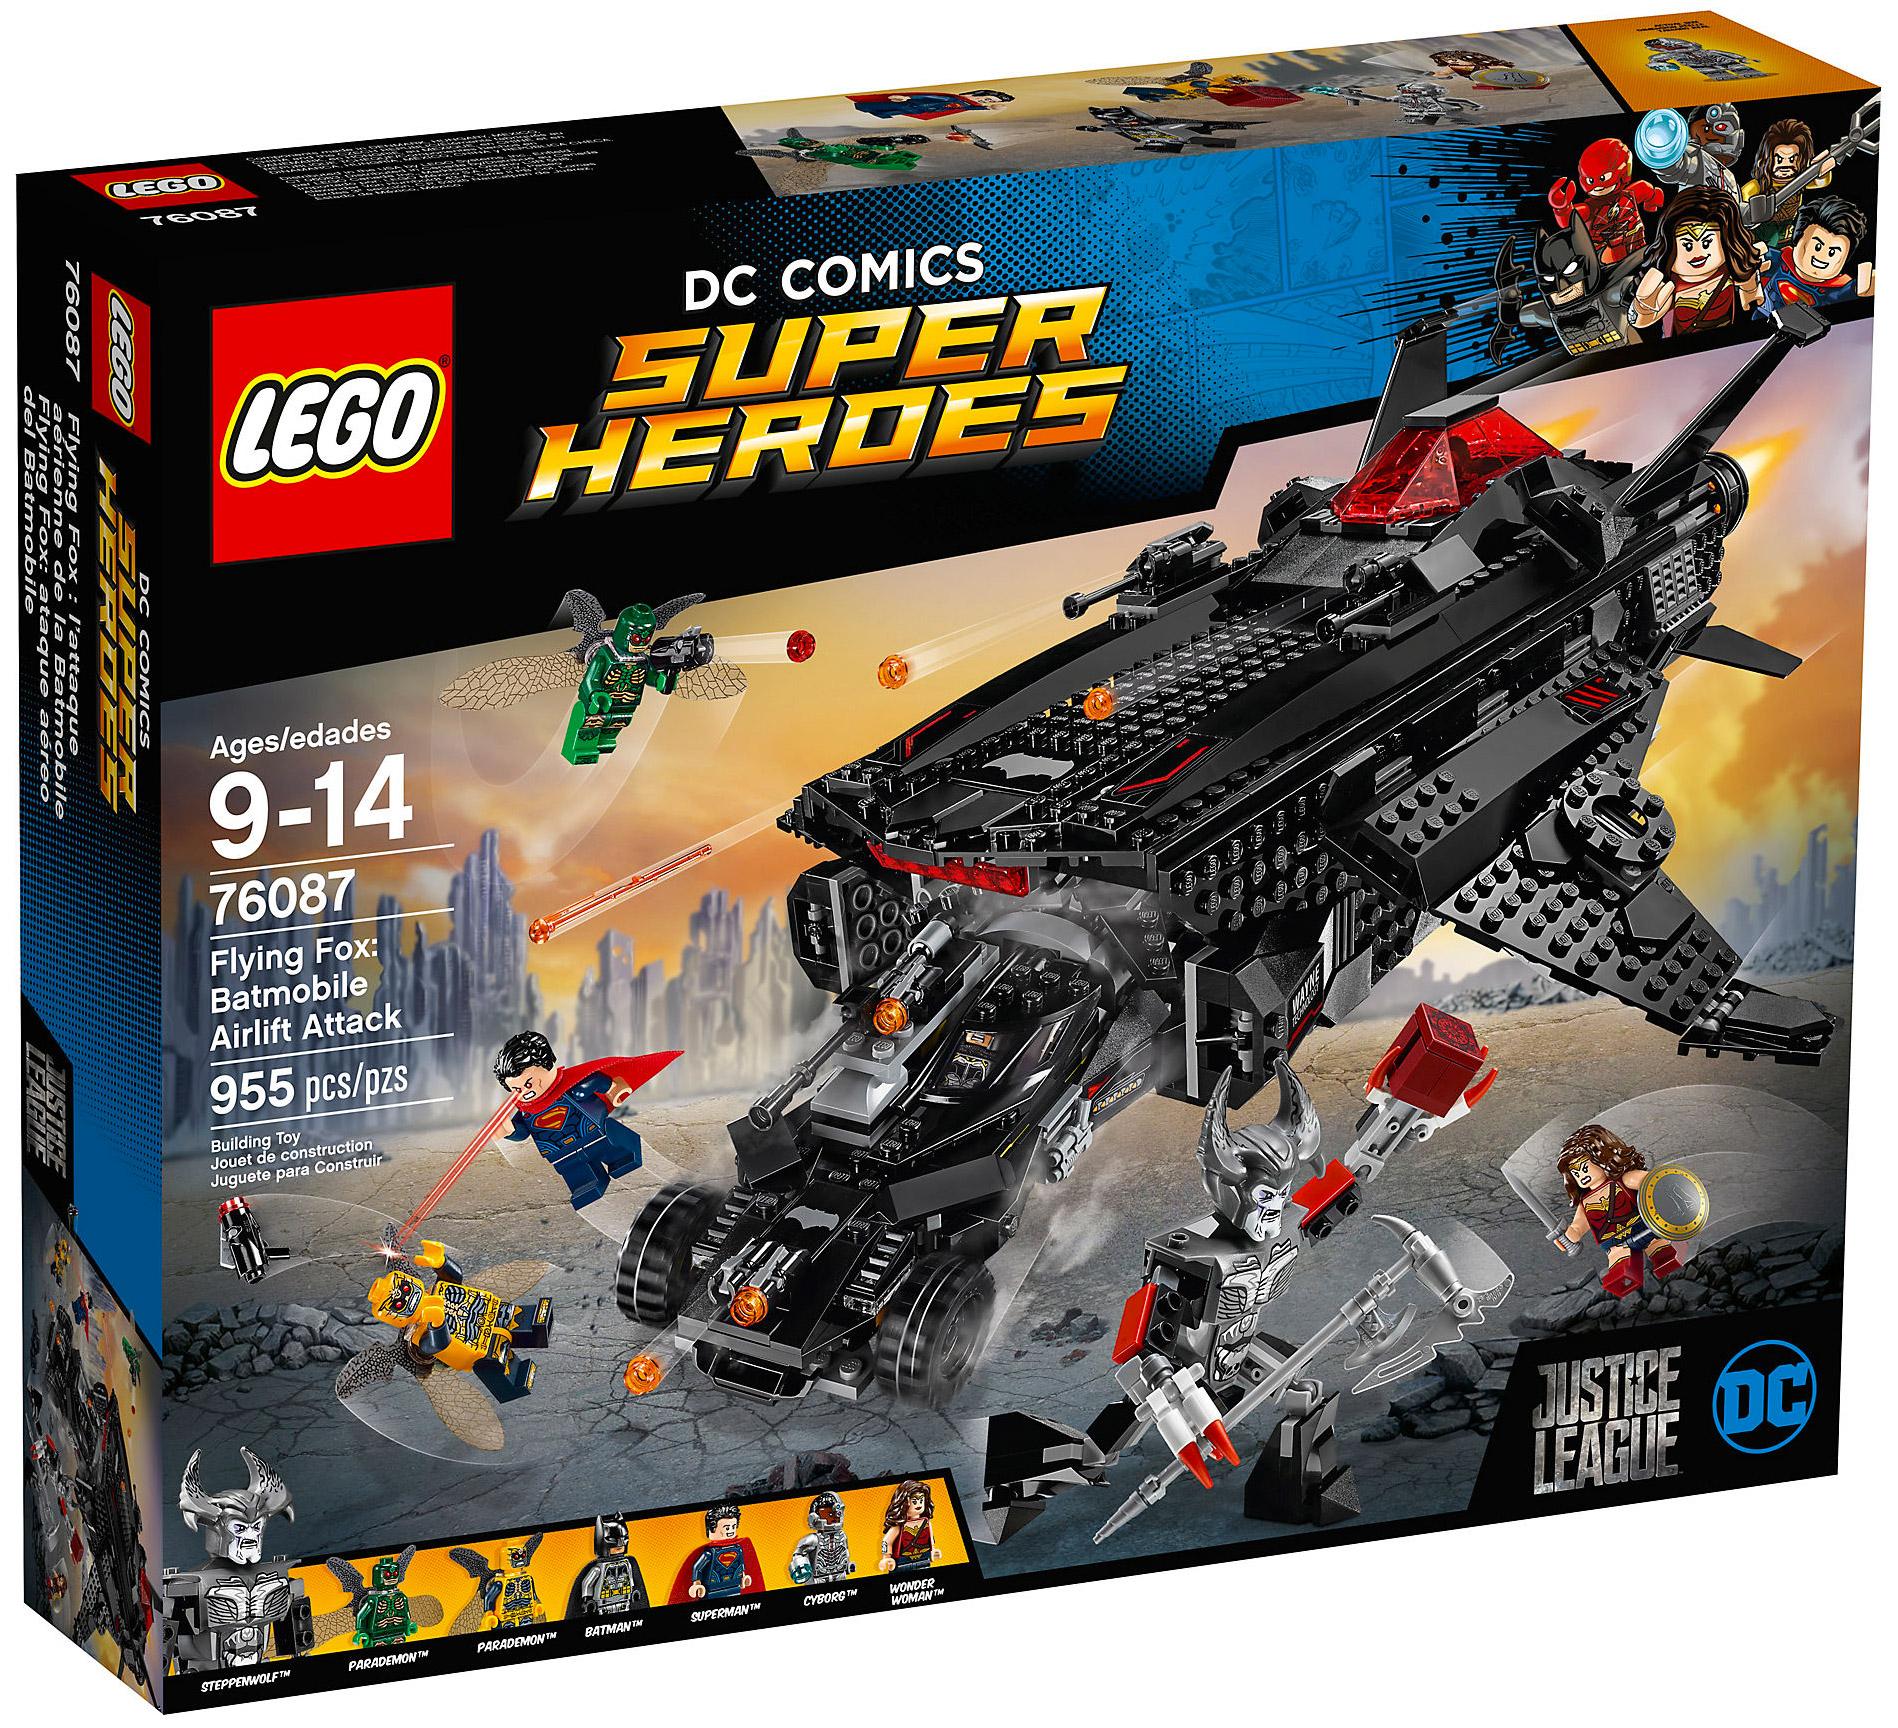 Super Heroes CherBatman Dc Comics Lego 4526 Pas ym80wNnOvP